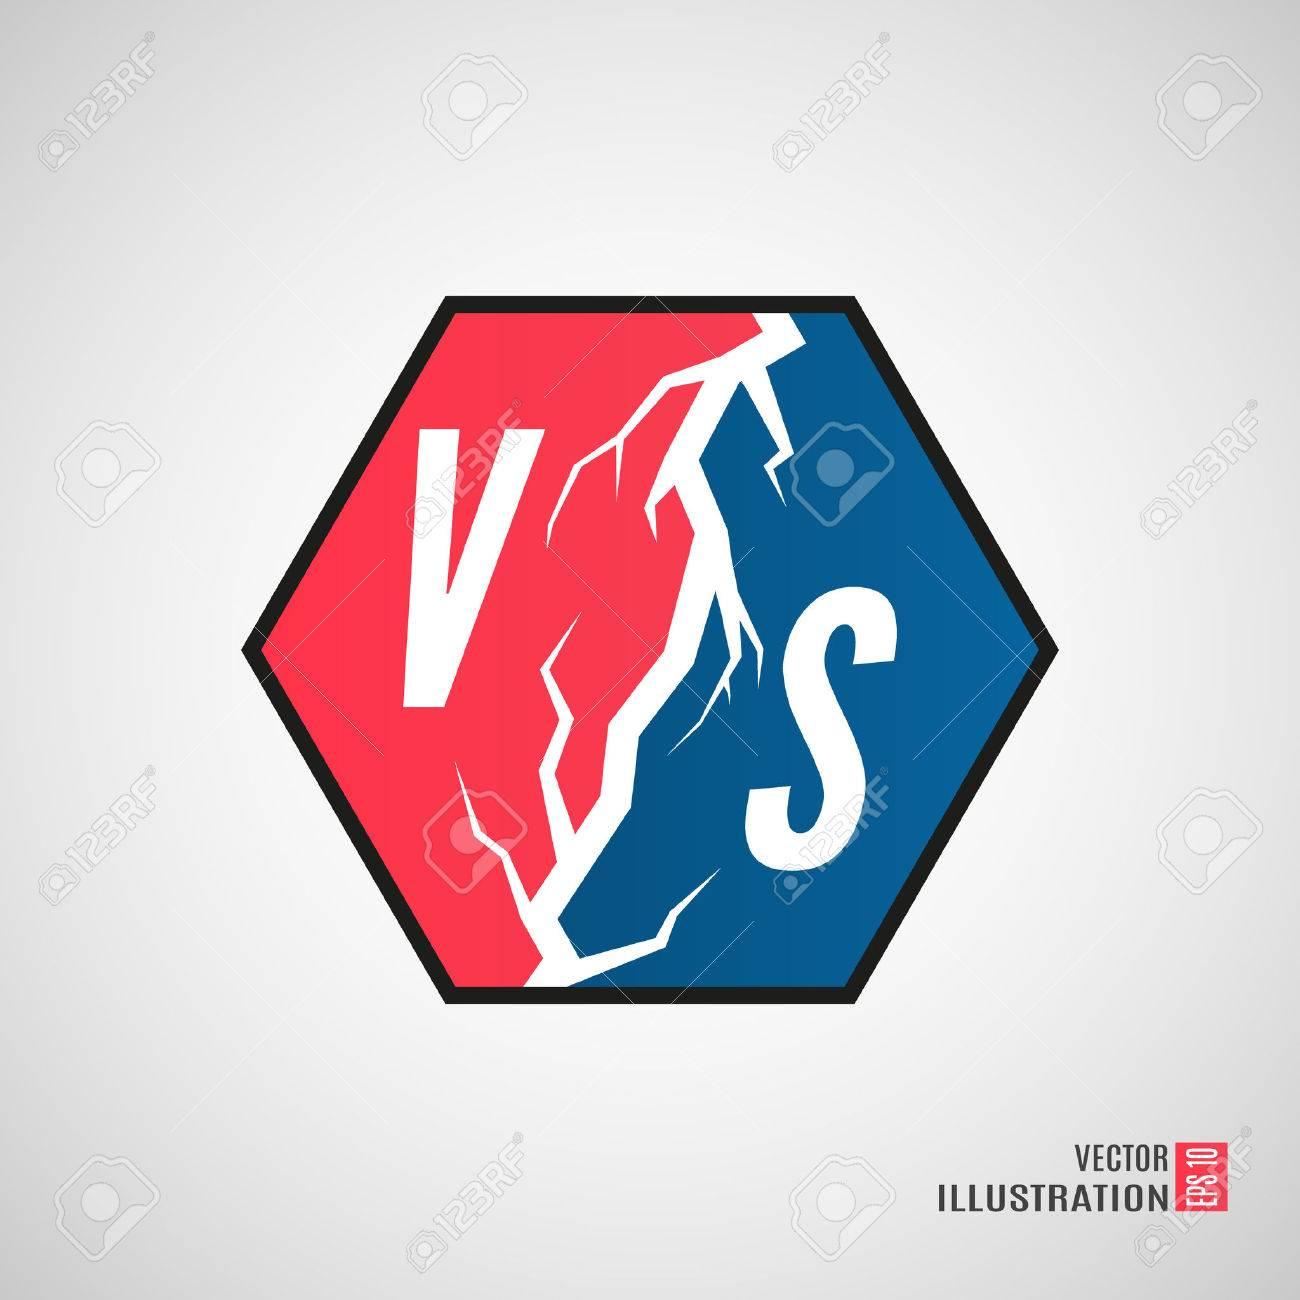 Background image vs background - Versus Logo Vs Vector Letters Illustration Isolated On White Background Stock Vector 49363513